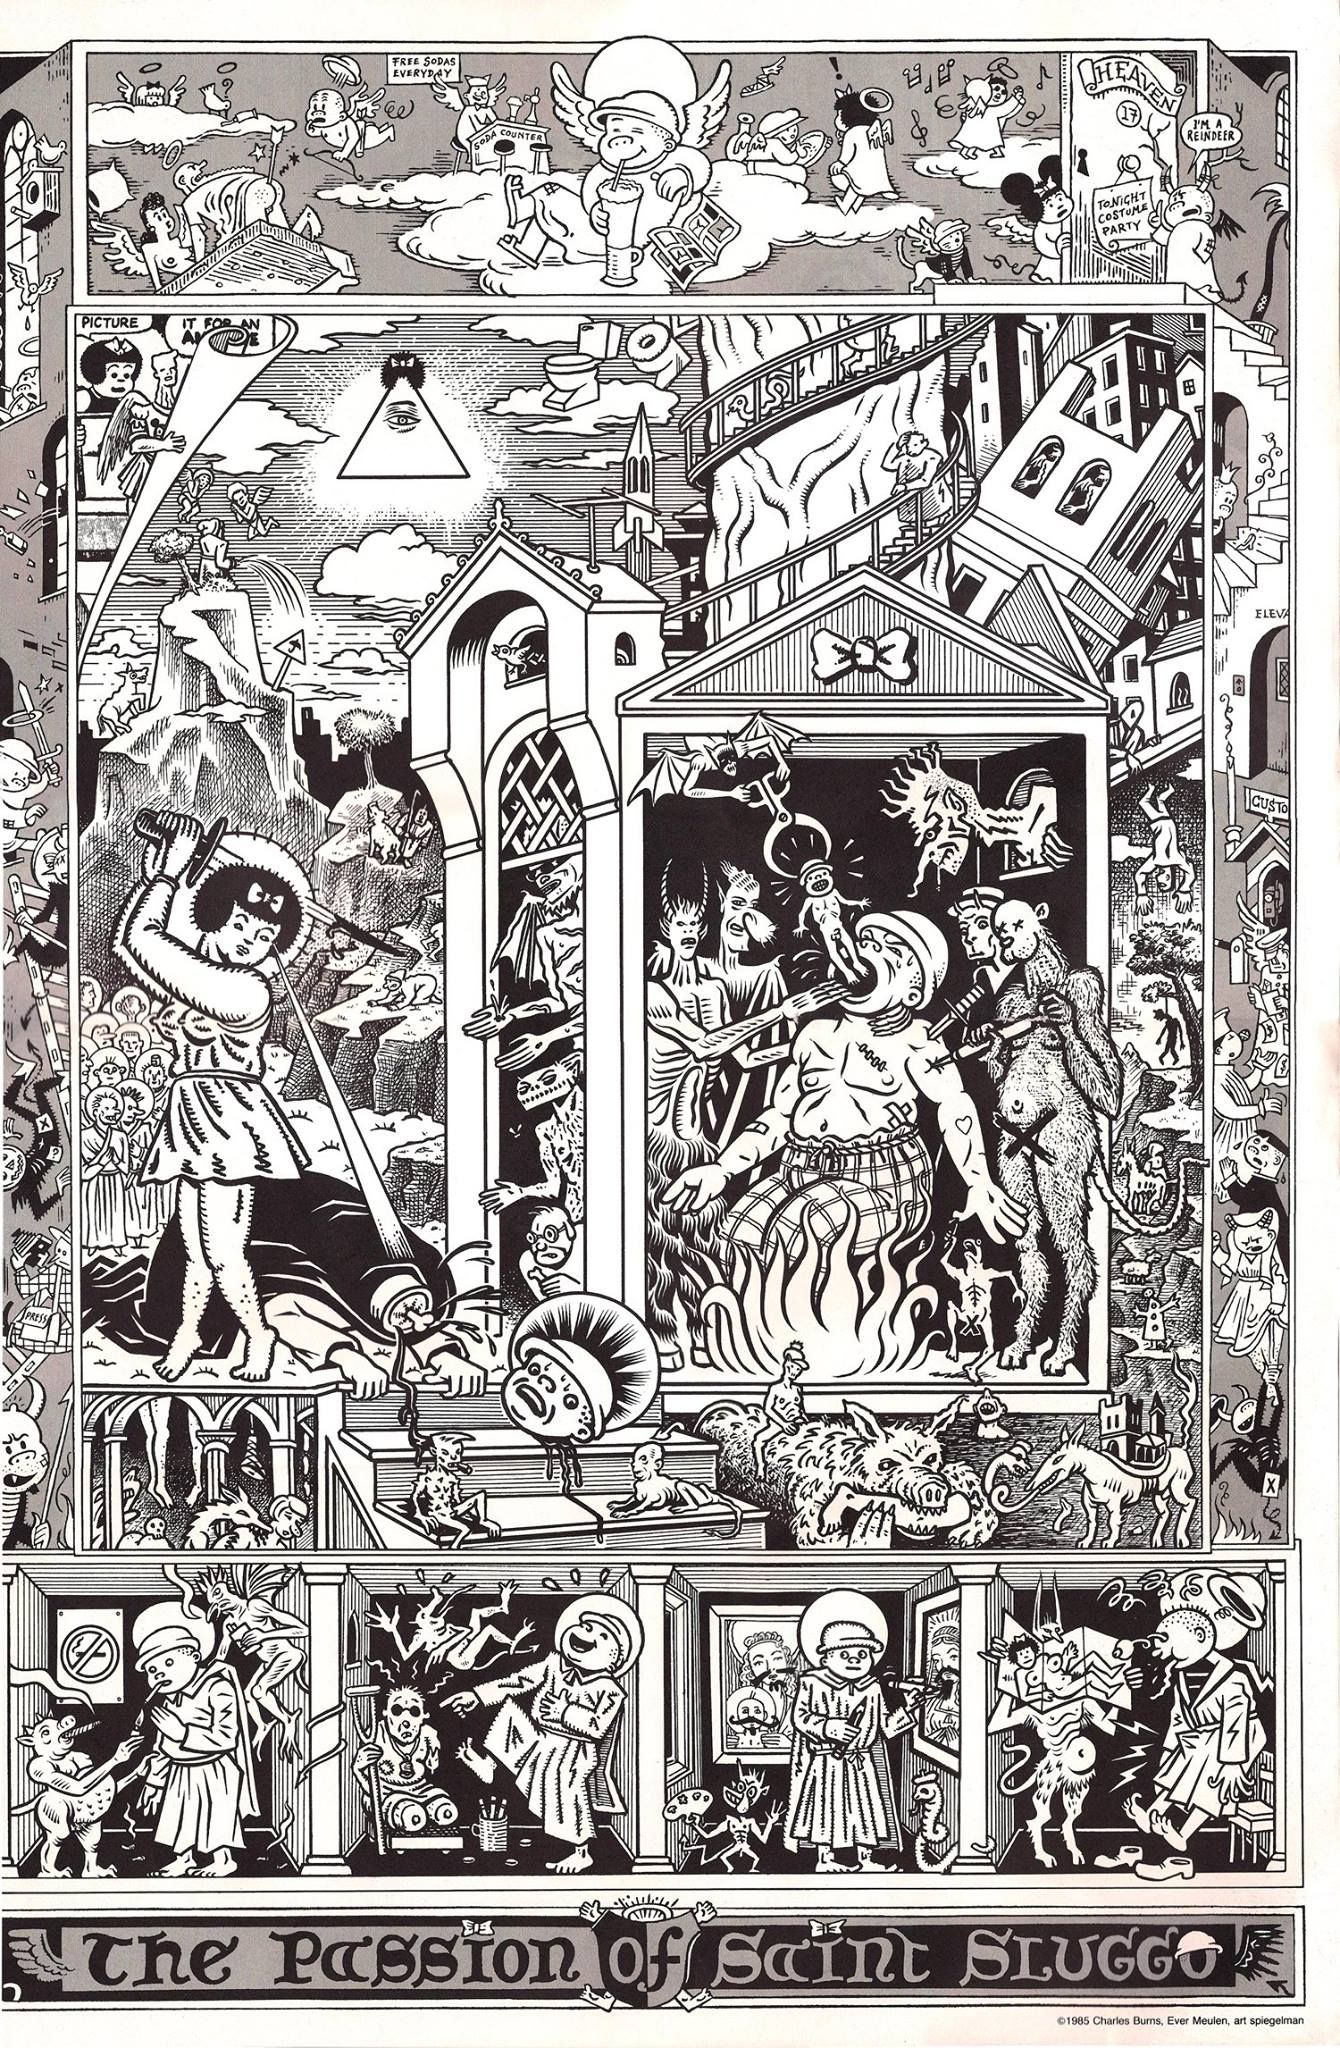 Art Spiegelman, Ever Meulen, Charles Burns - The Passion of Saint Sluggo